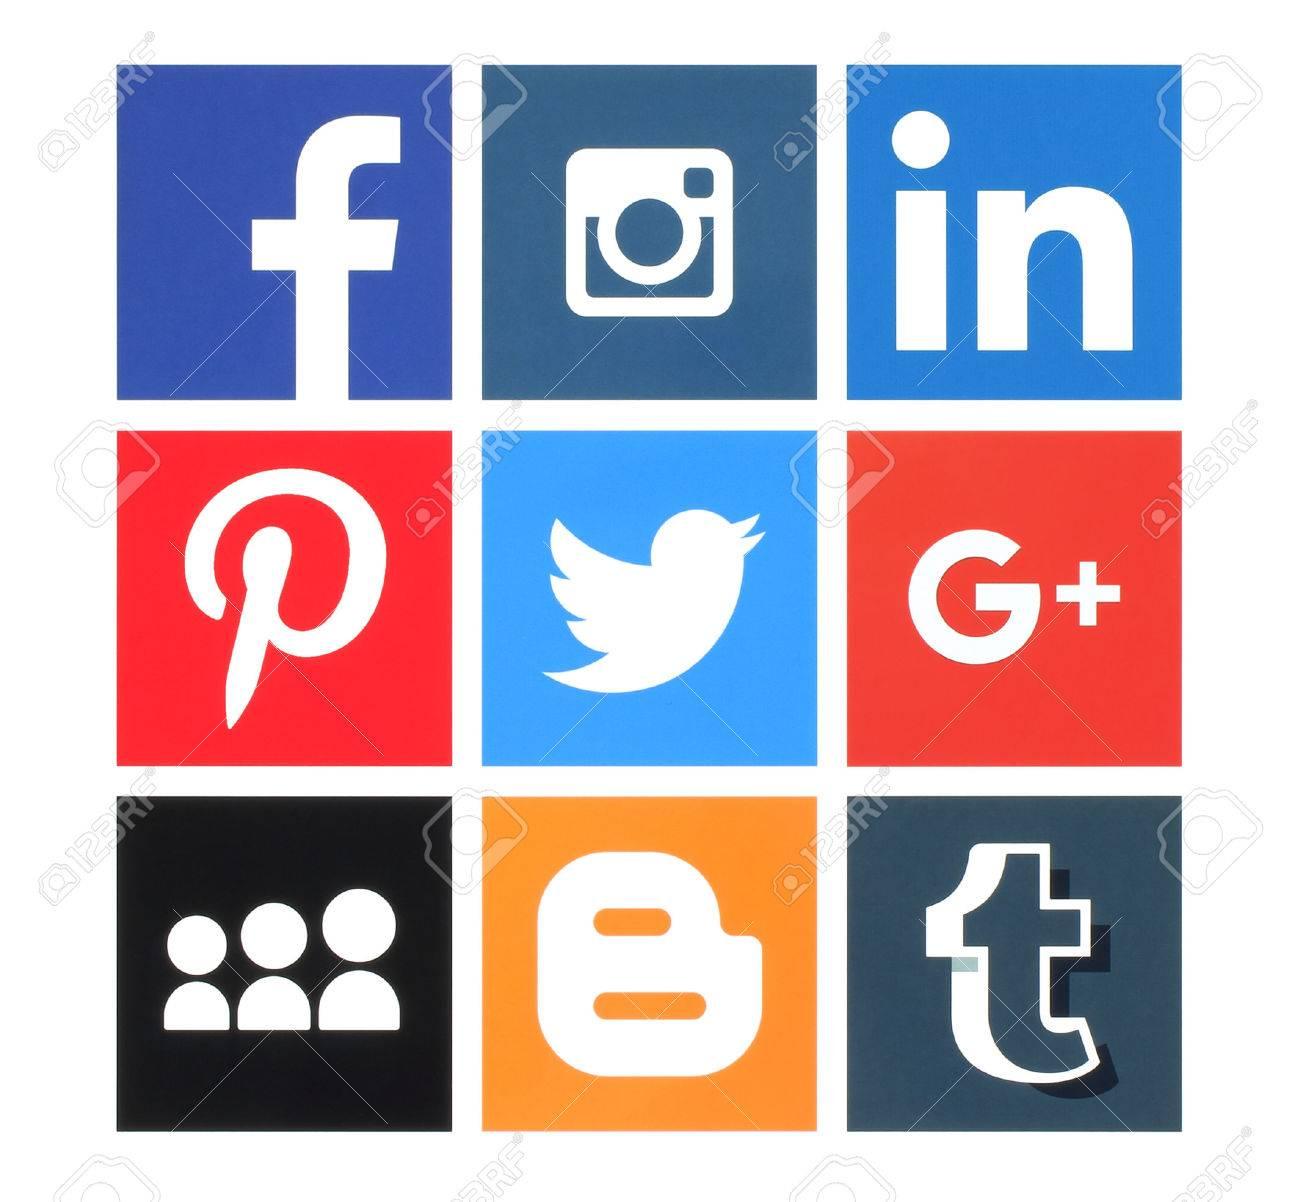 Kiev, Ukraine - March 8, 2016: Collection of popular social media logos printed on paper:Facebook, Twitter, Google Plus, Instagram, MySpace, LinkedIn, Pinterest, Tumblr and Blogger - 53643264